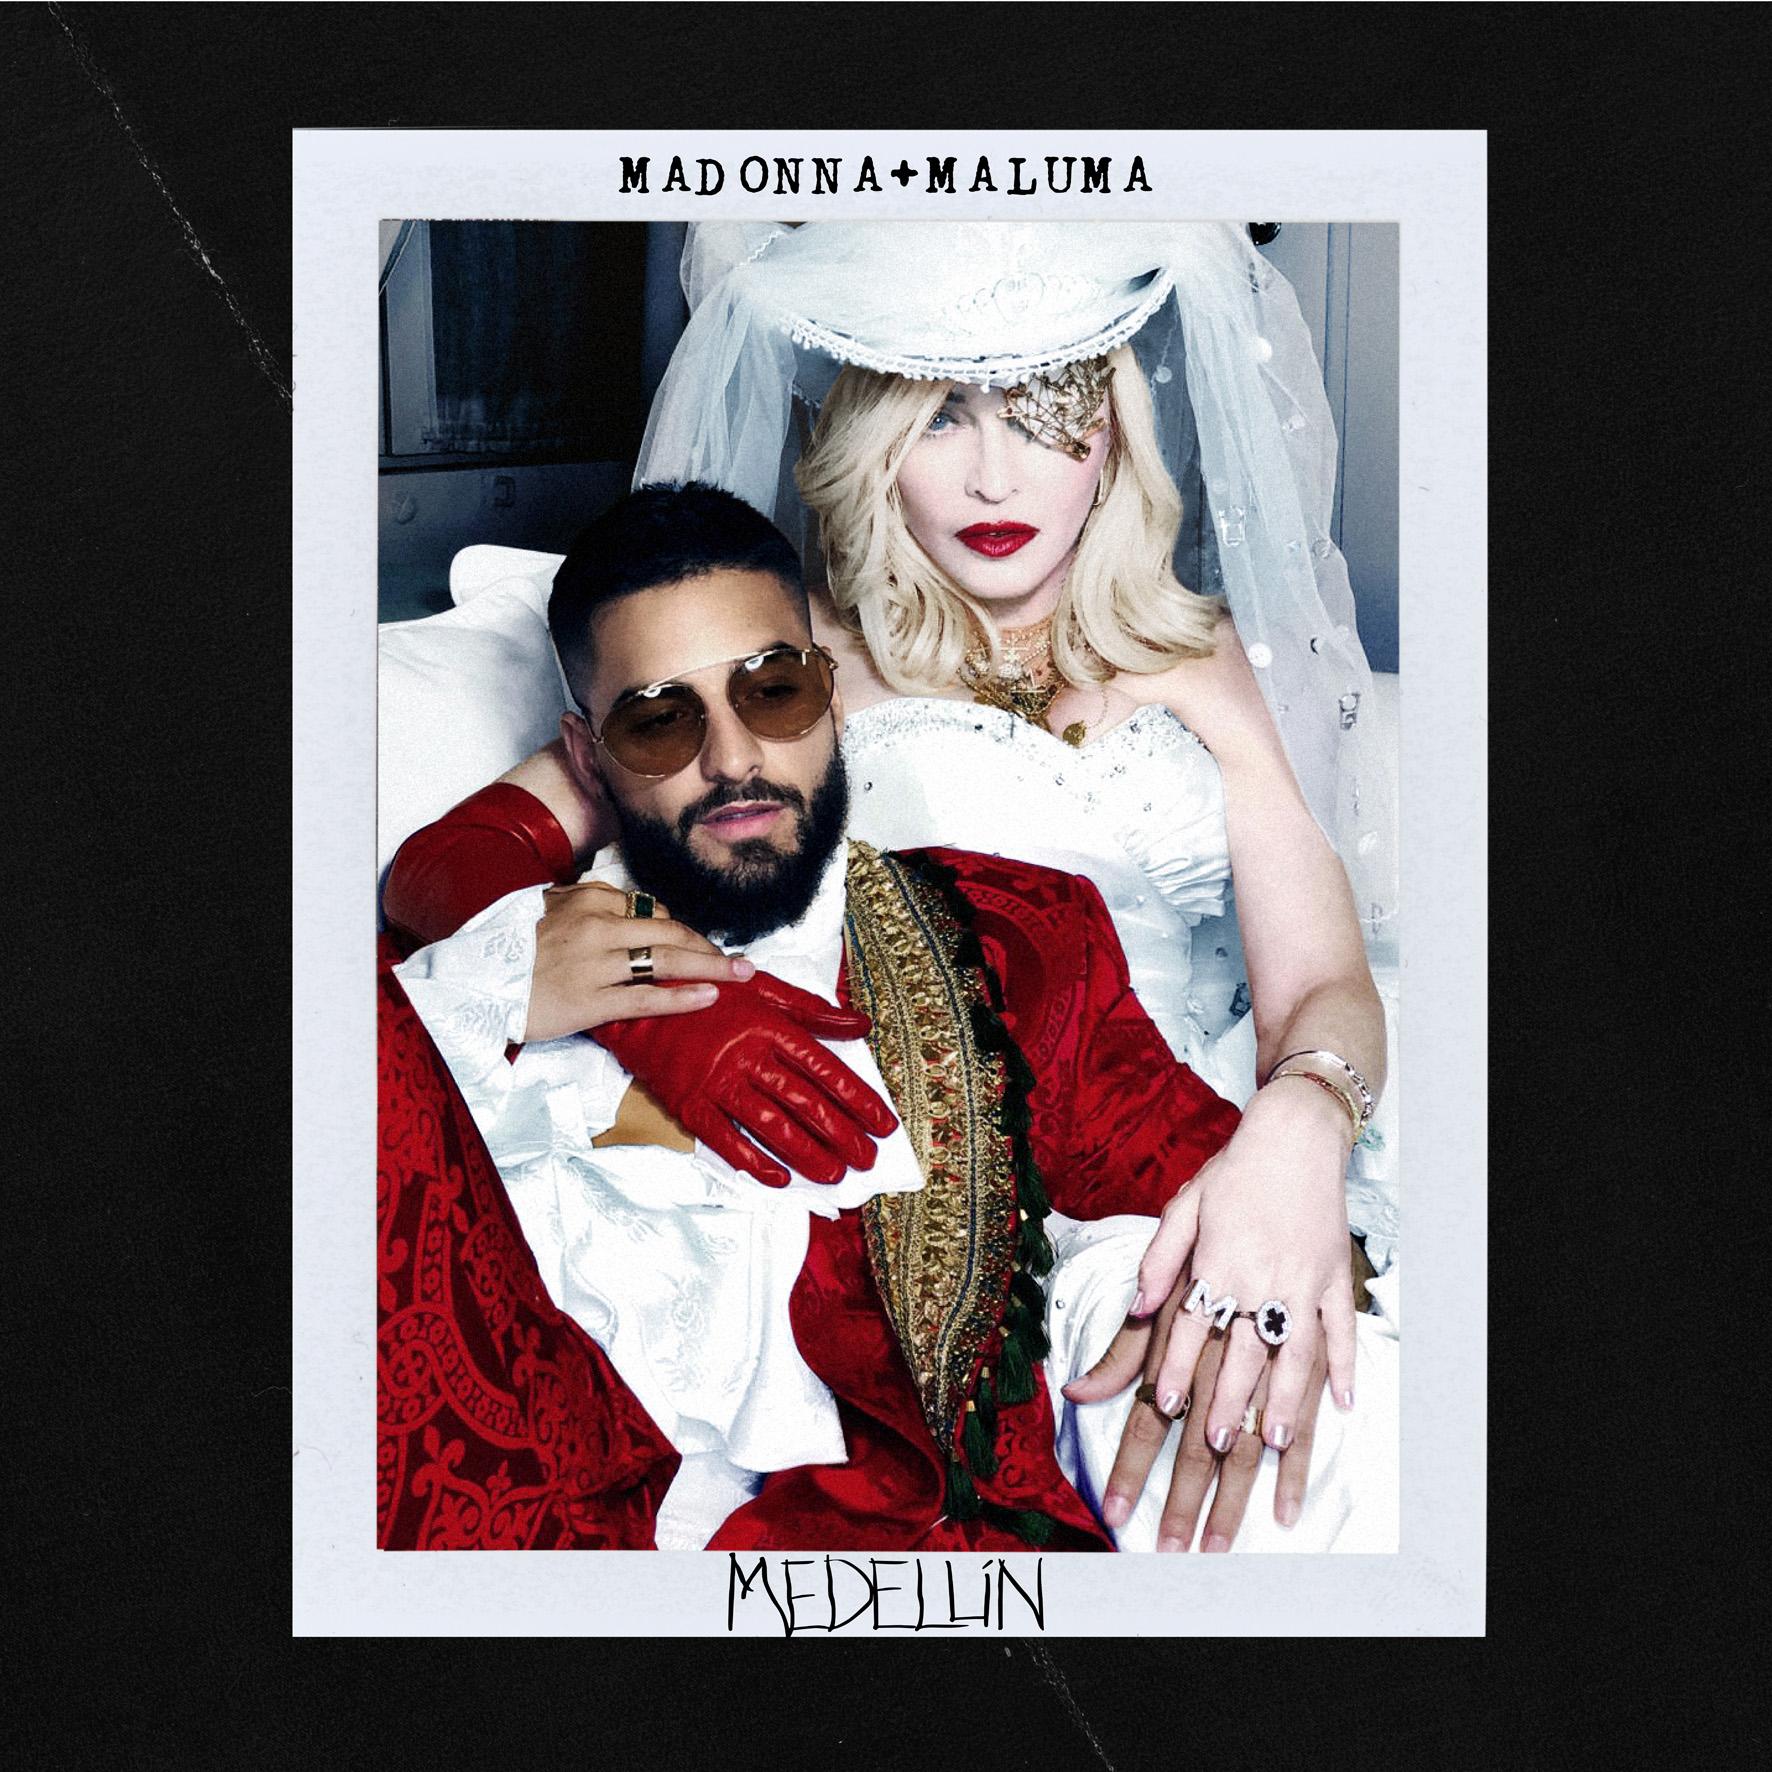 Madonna - Mendellin